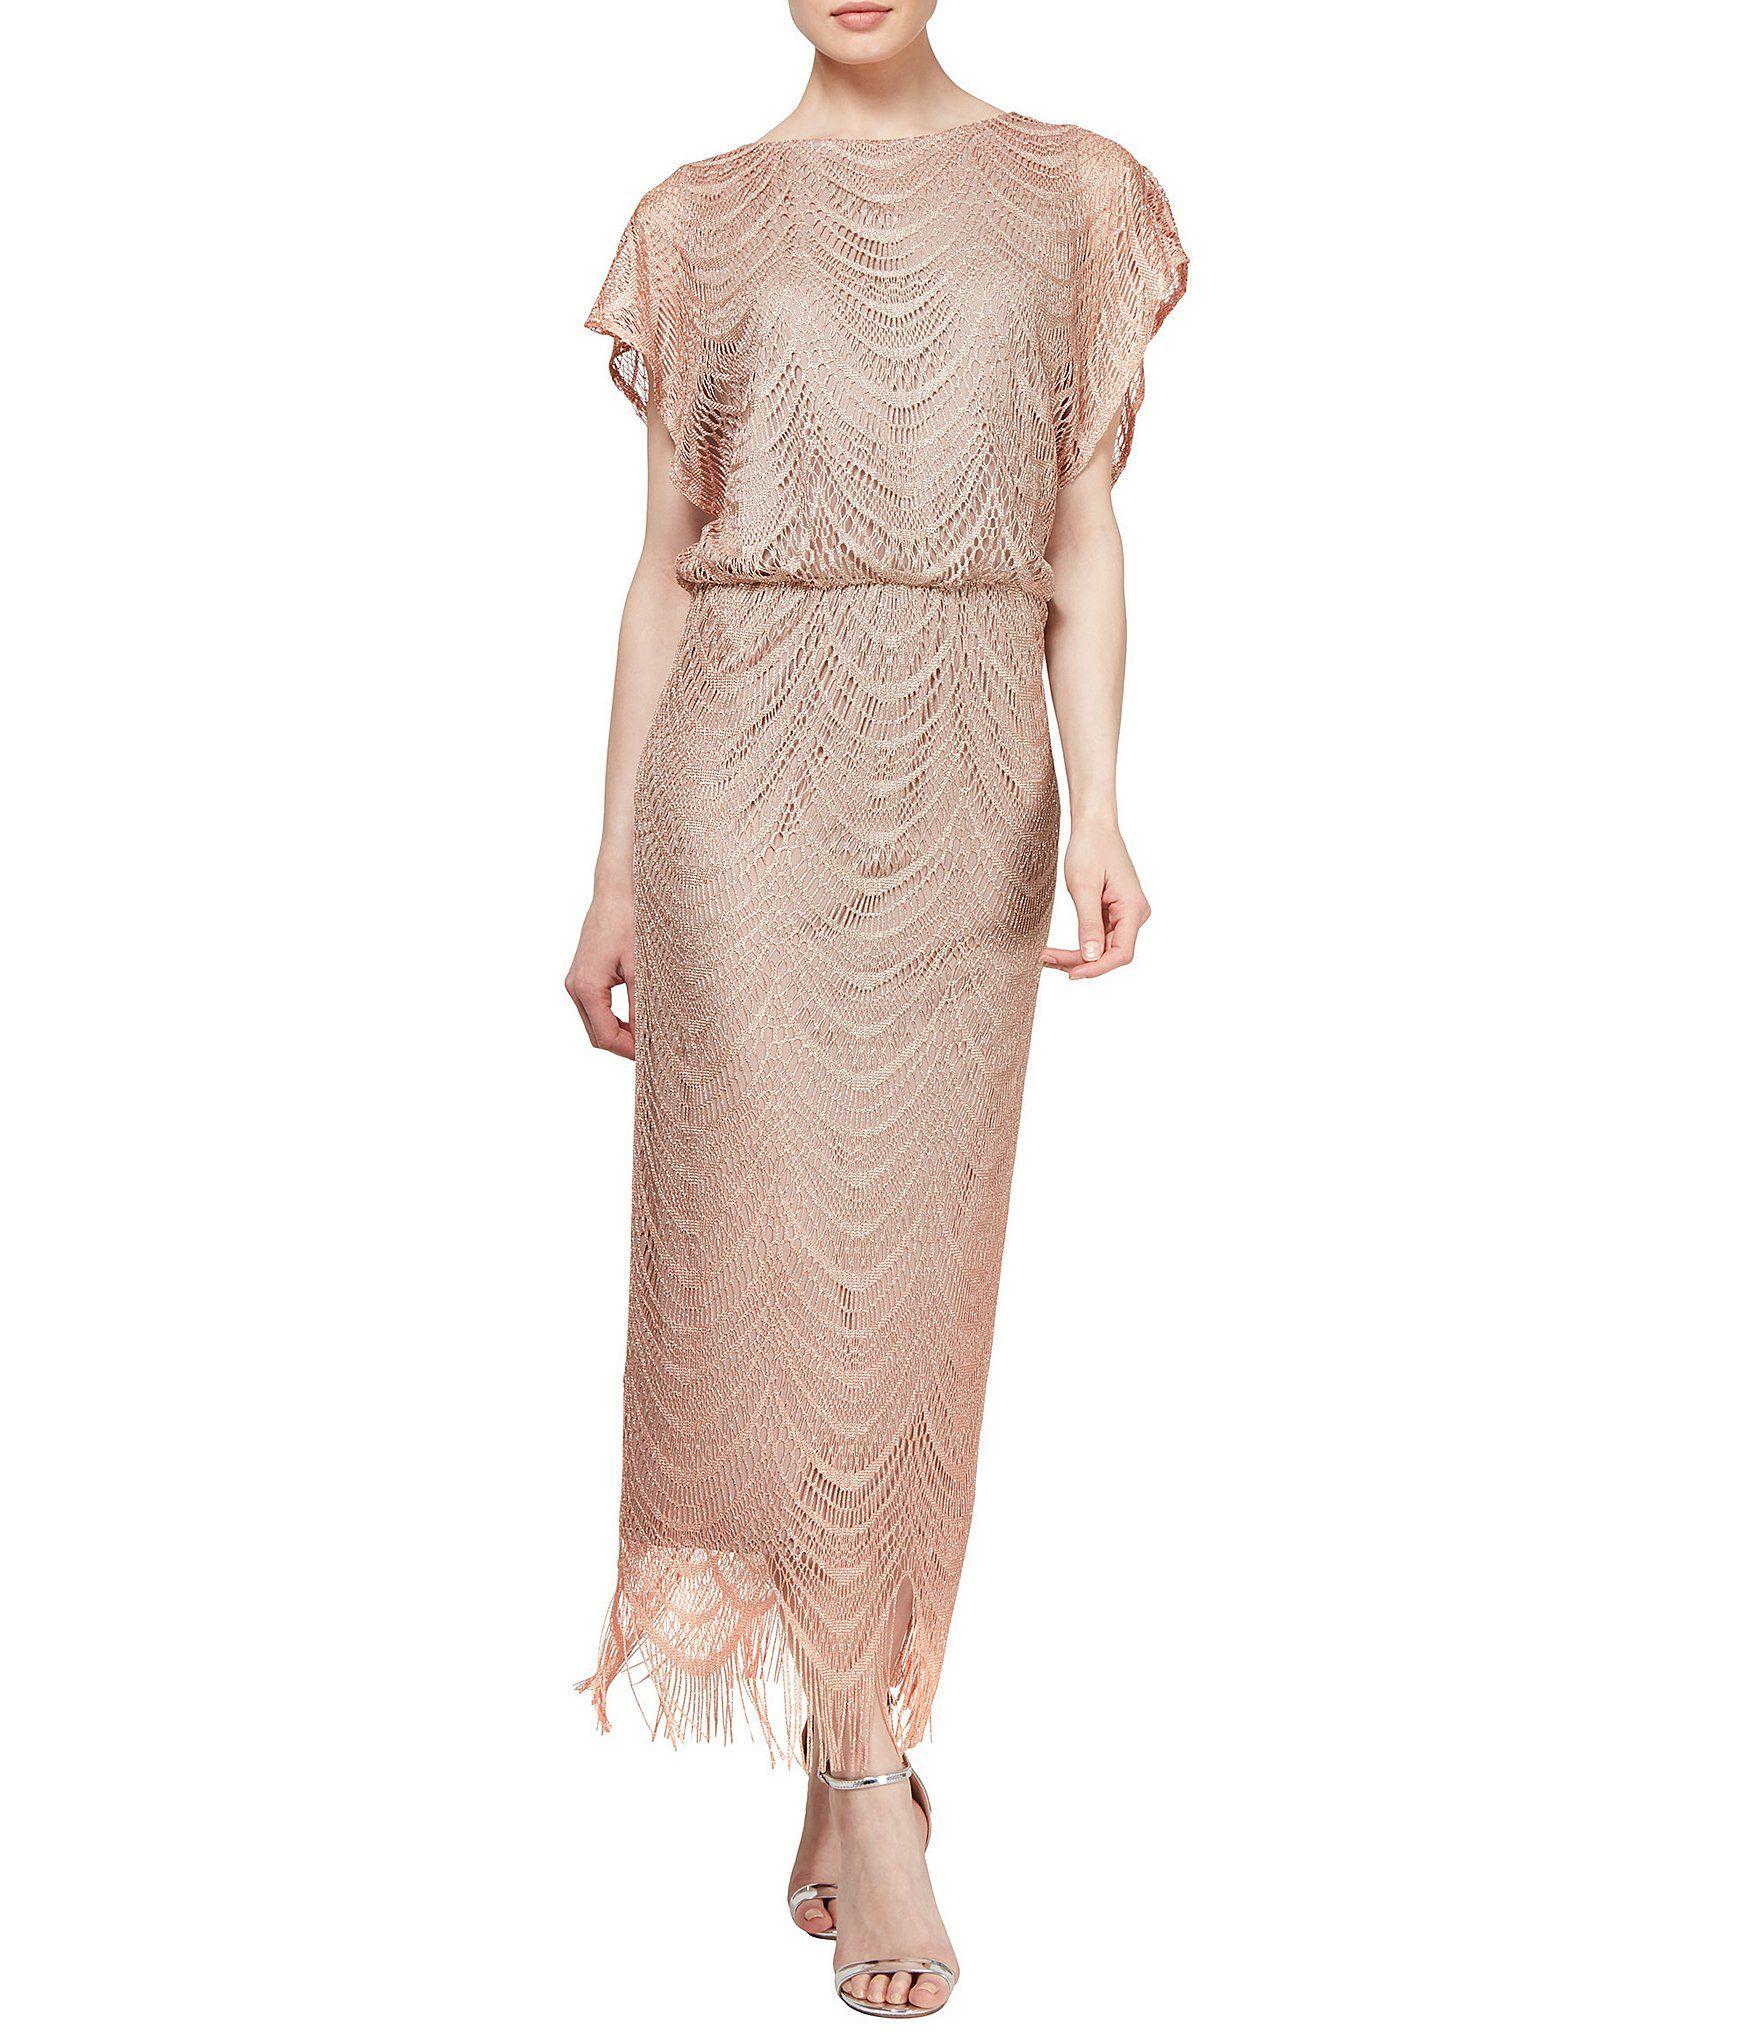 Ignite Evenings Short Sleeve Fringe Hem Crochet Blouson Long Dress Dillard S Fashion Sl Fashions Maxi Dress Cocktail [ 2040 x 1760 Pixel ]